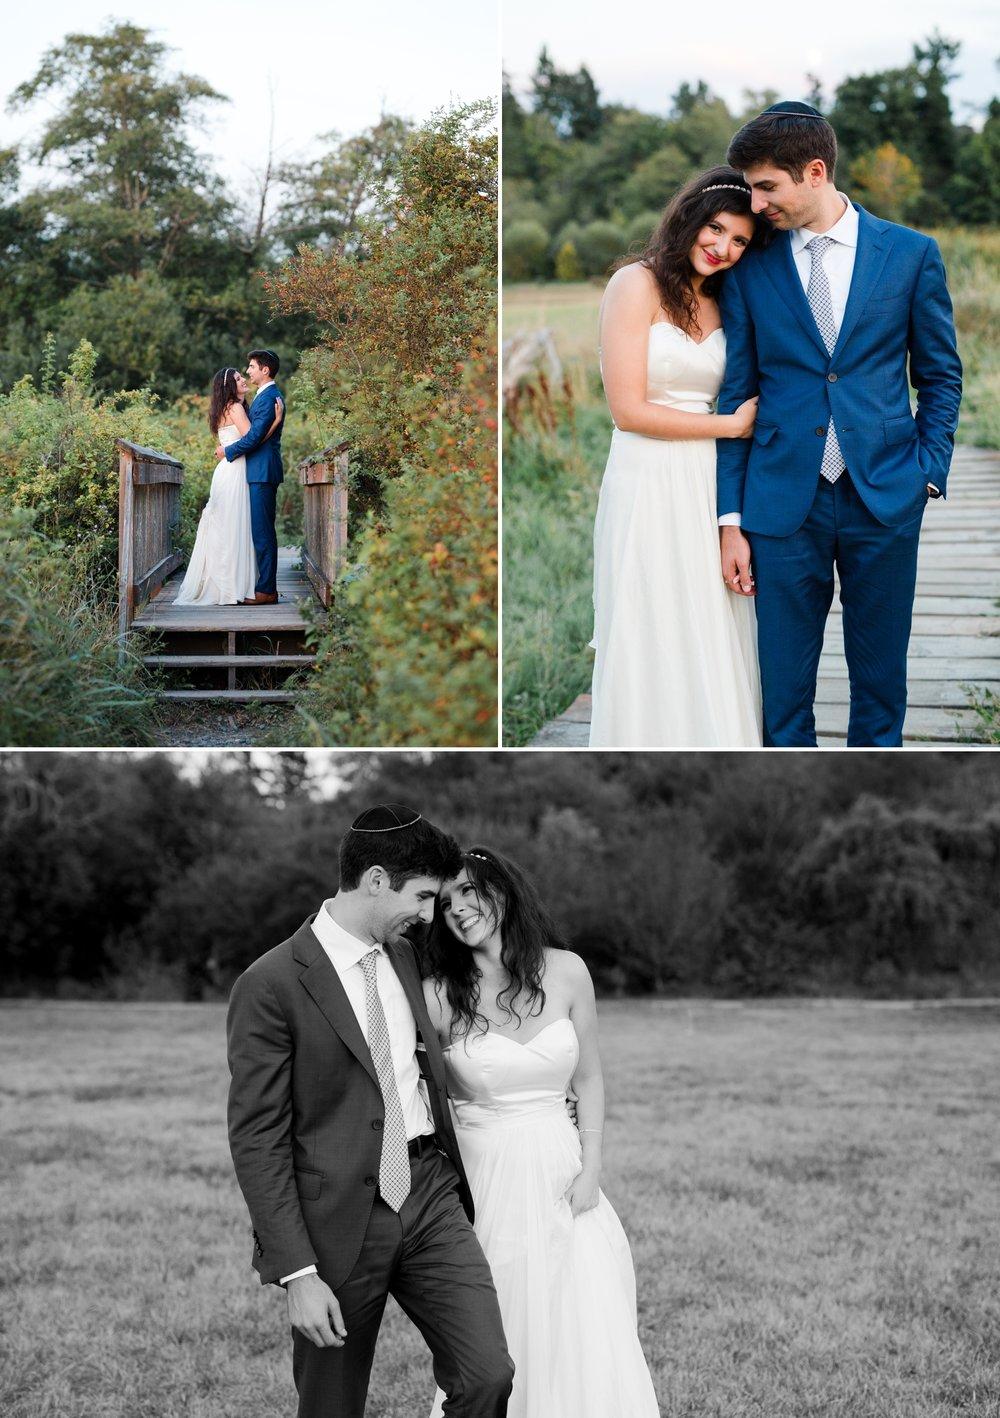 18-bride-groom-portraits-cove-seattle.jpg